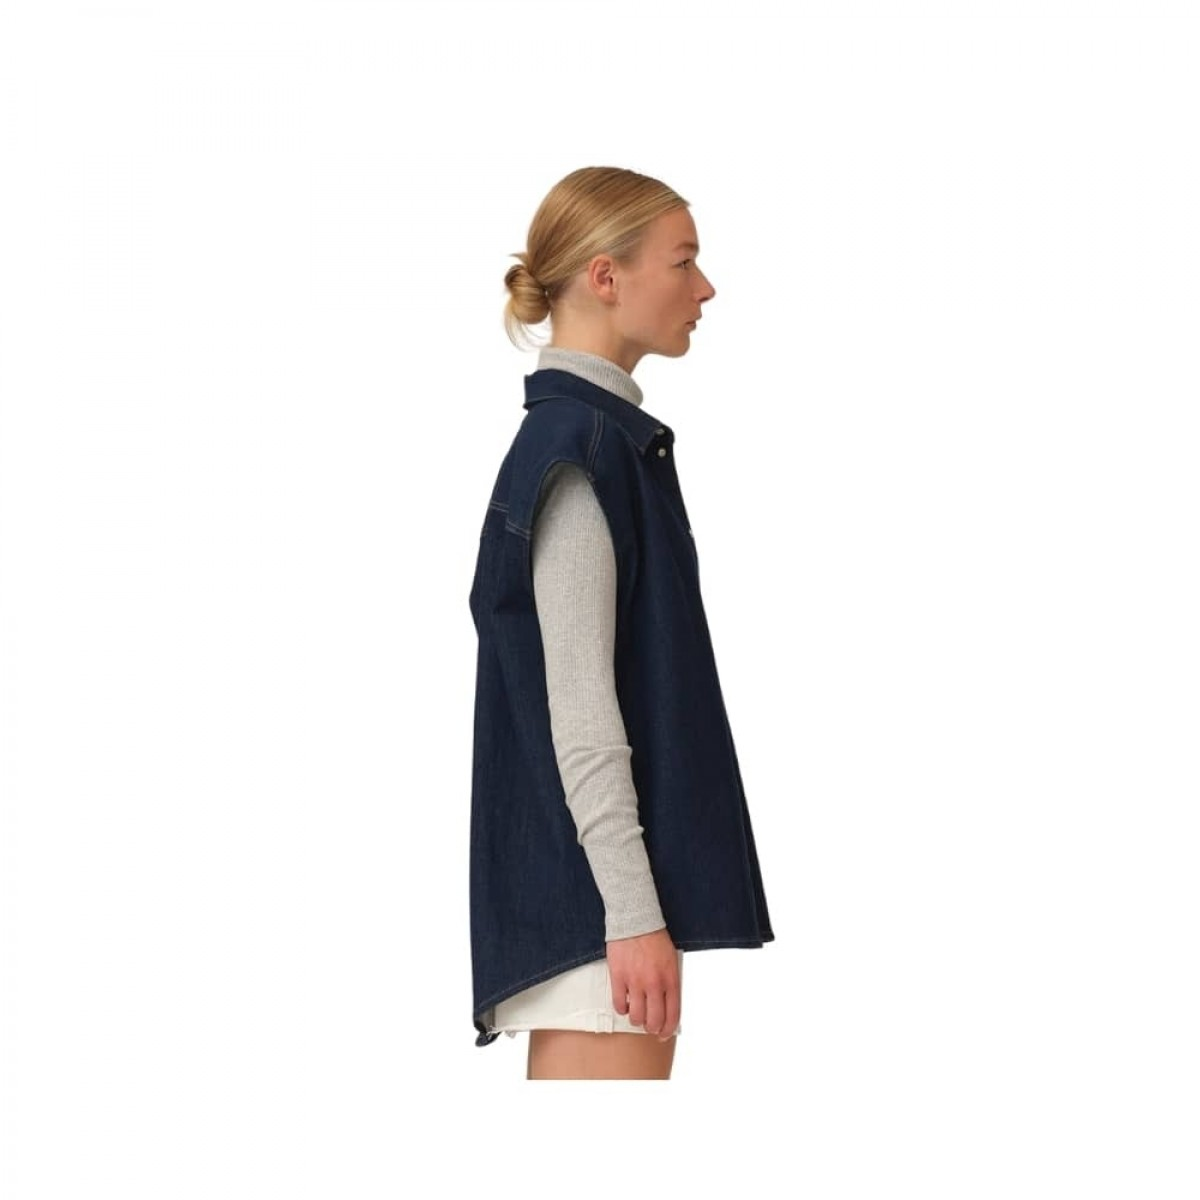 bowie oversize sl. less shirt - denim blue - model fra siden